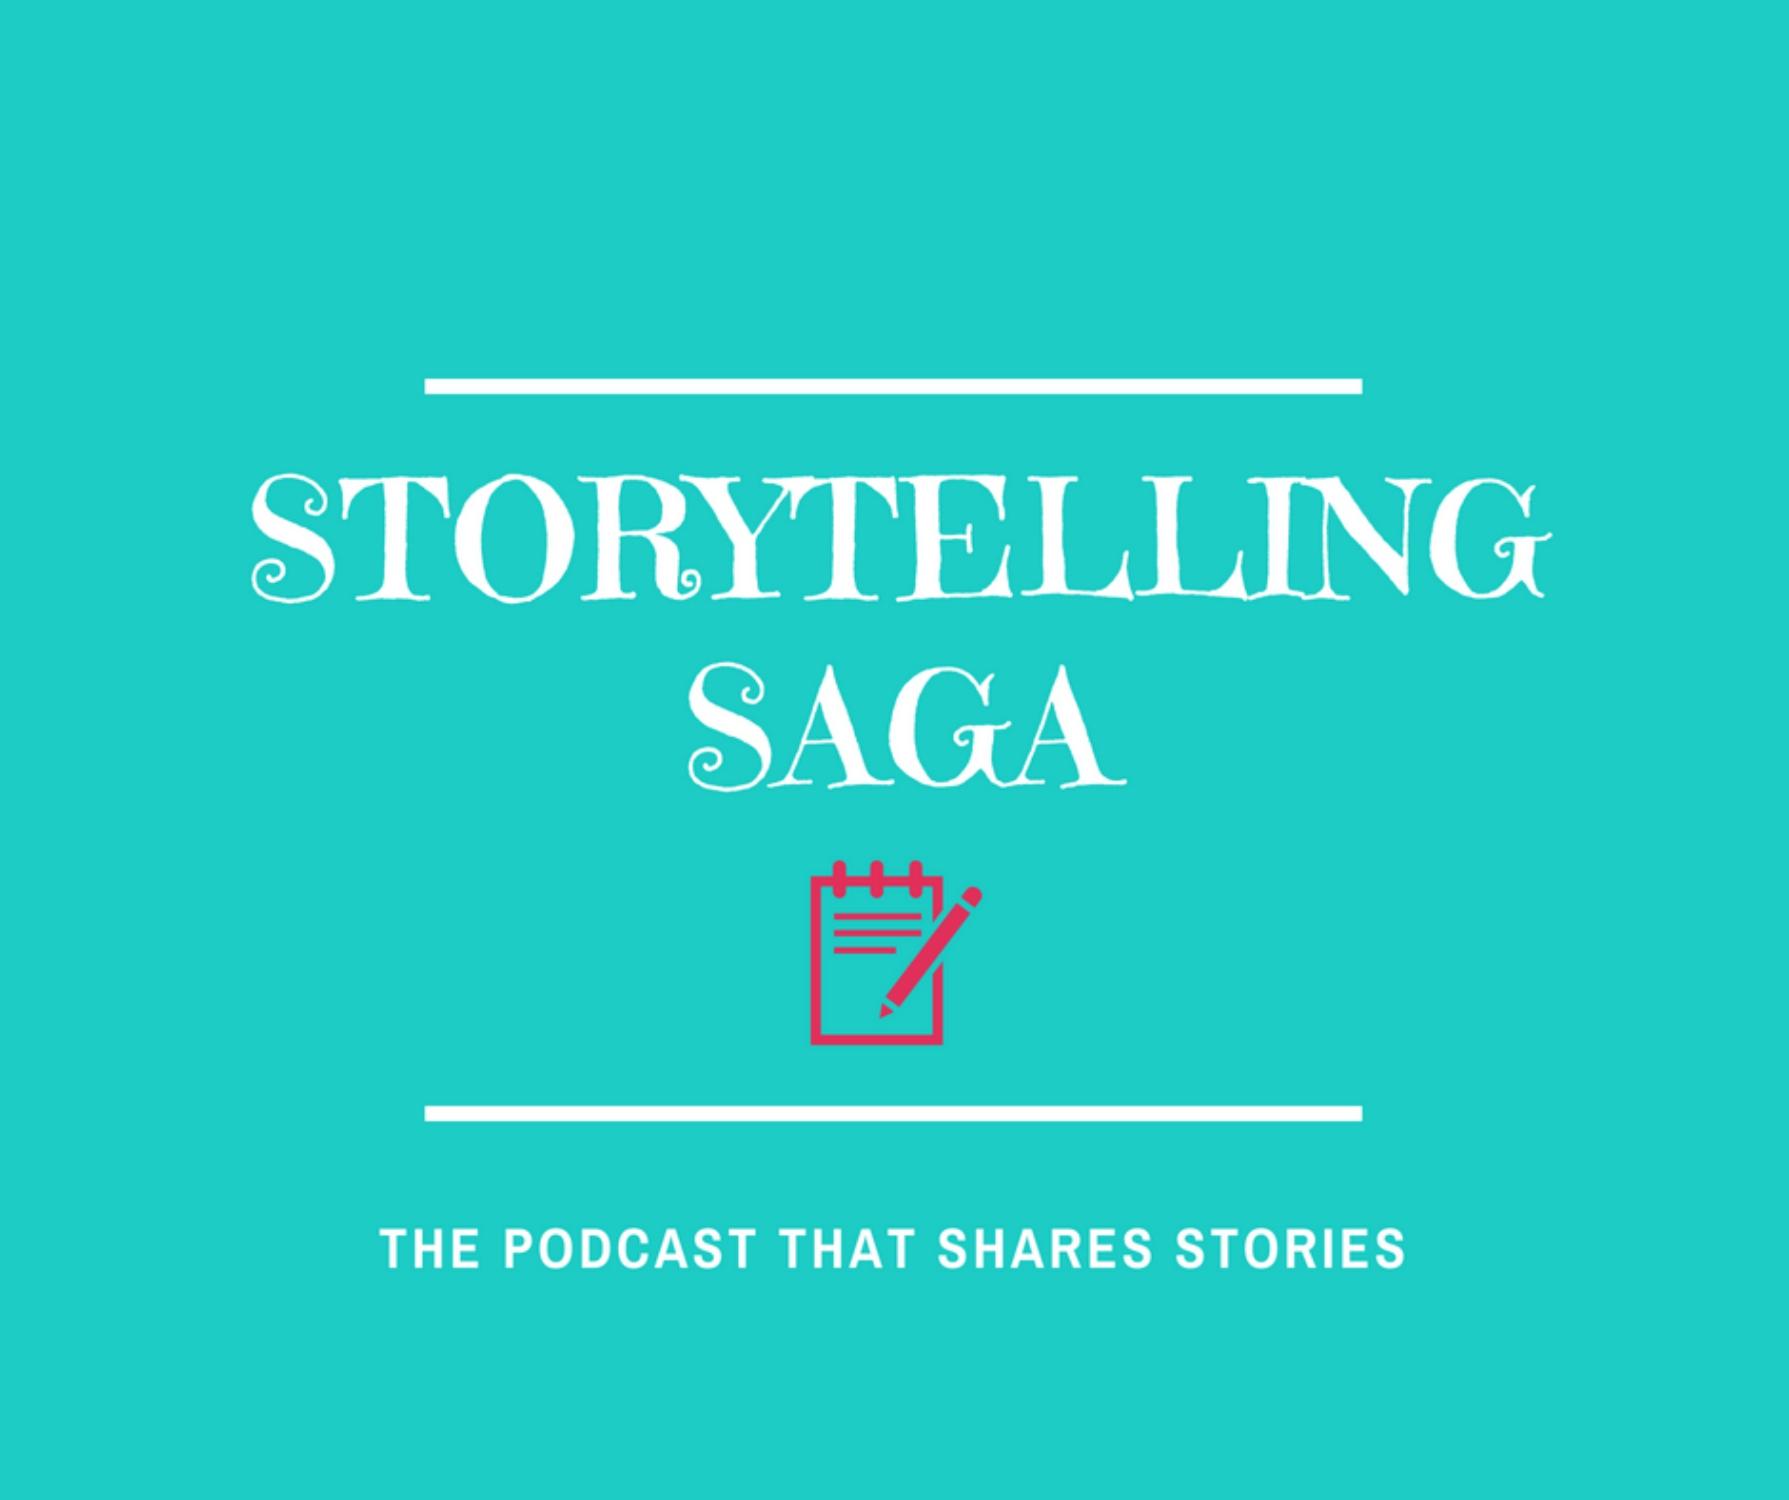 Storytelling Saga show art